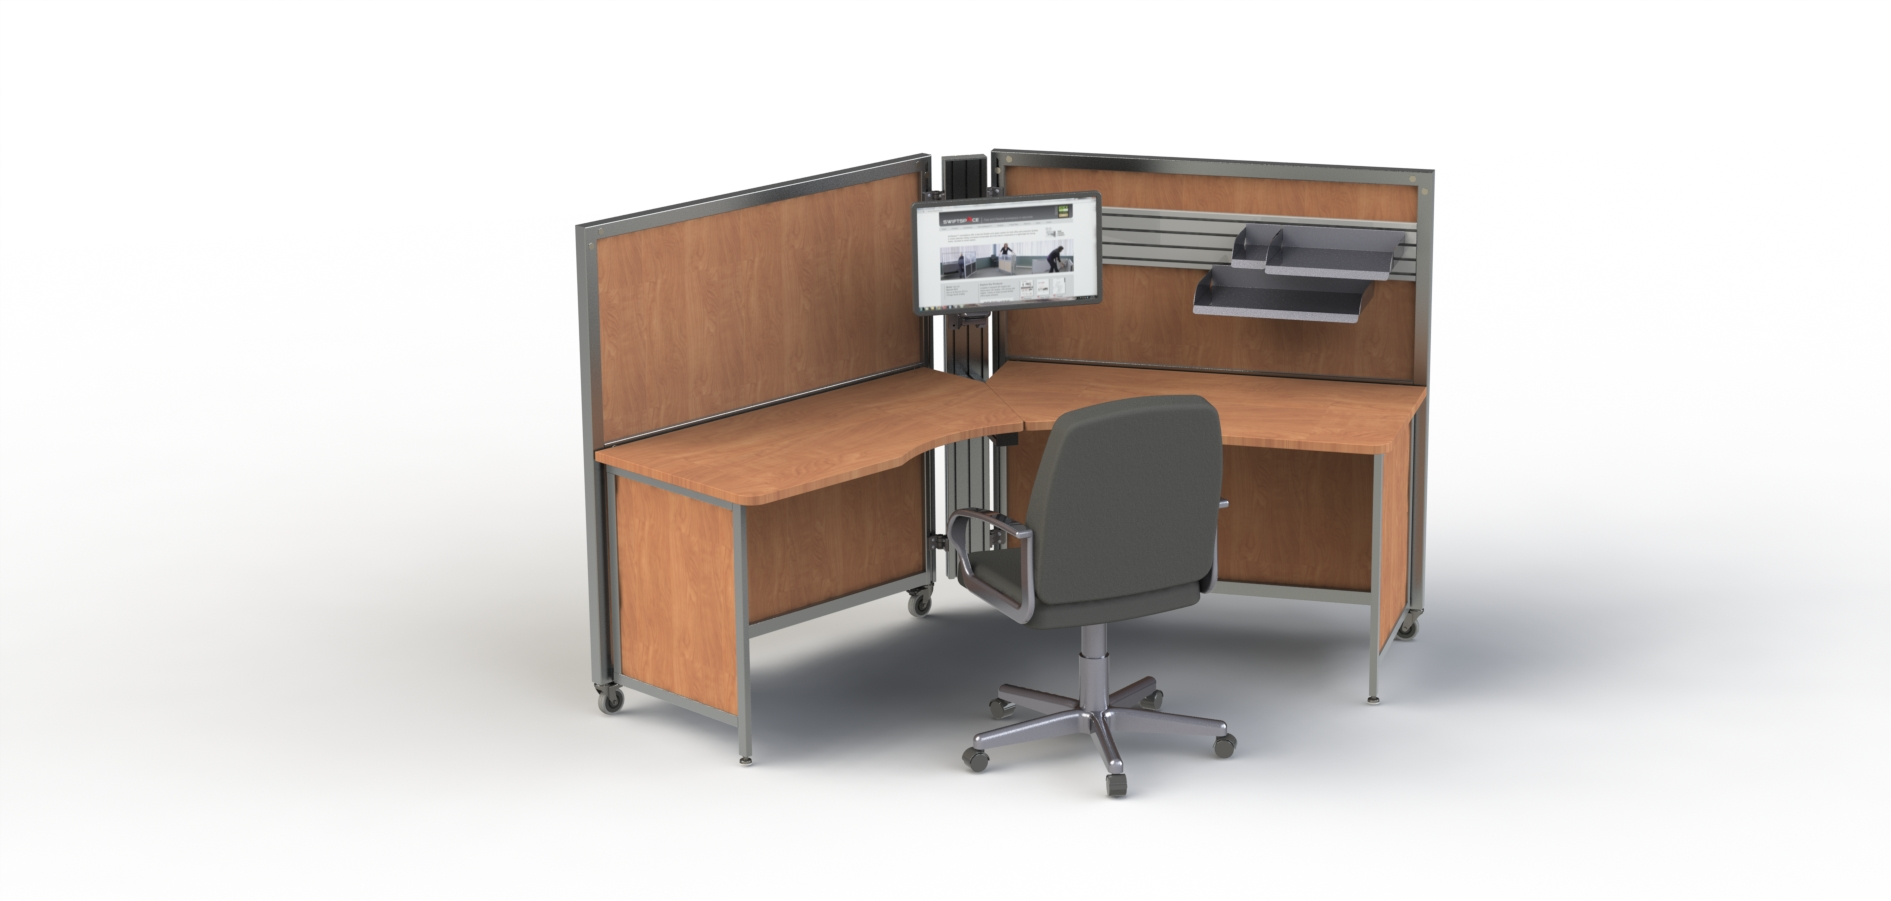 SwiftSpace 120 degree workstation